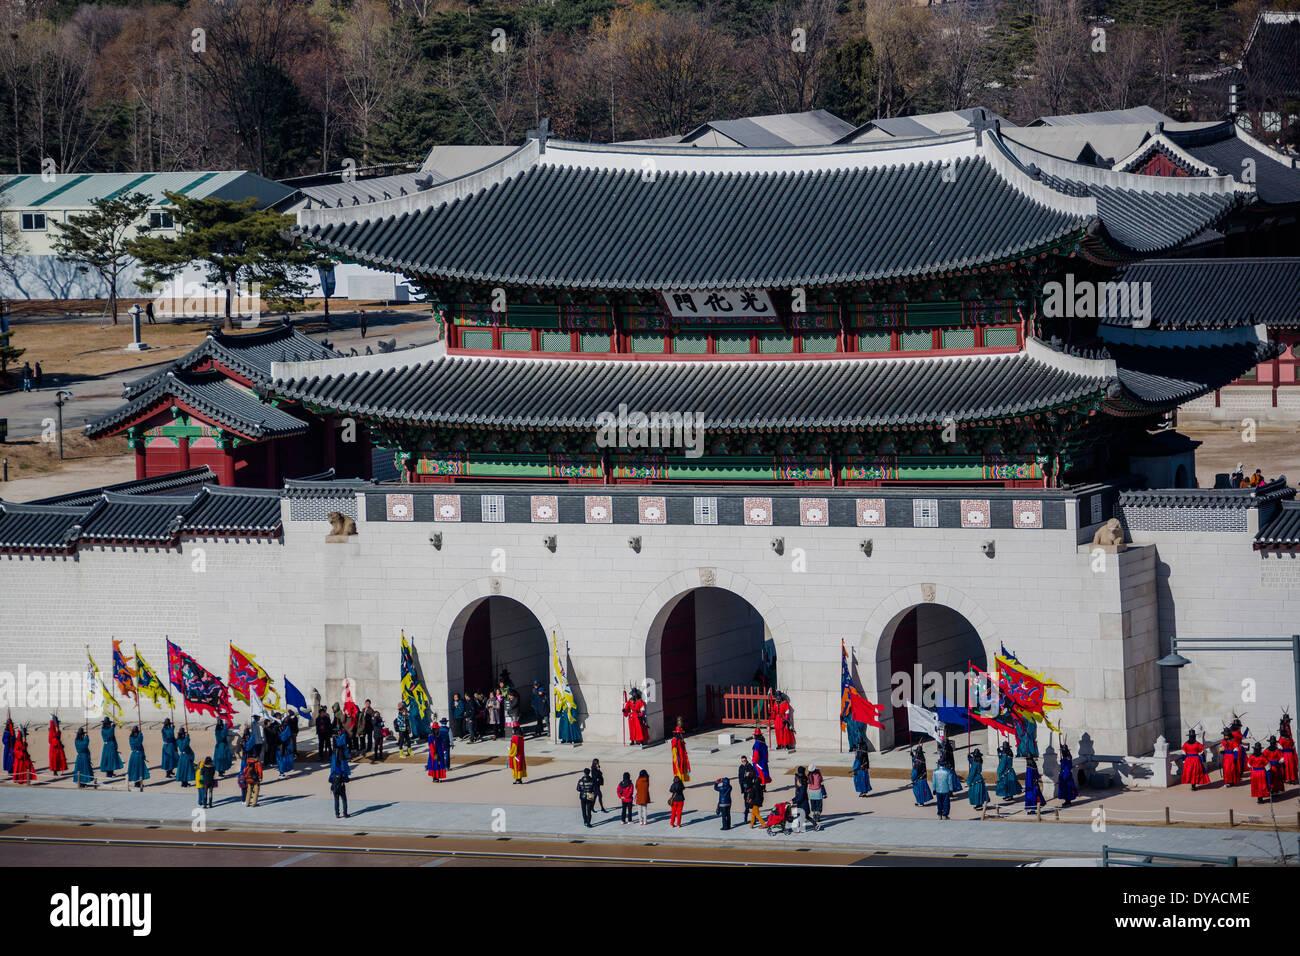 World Heritage Gwangwha-mun Korea Asia Kyongbok Palace Parade Seoul aerial architecture city colourful entrance landmark gat - Stock Image